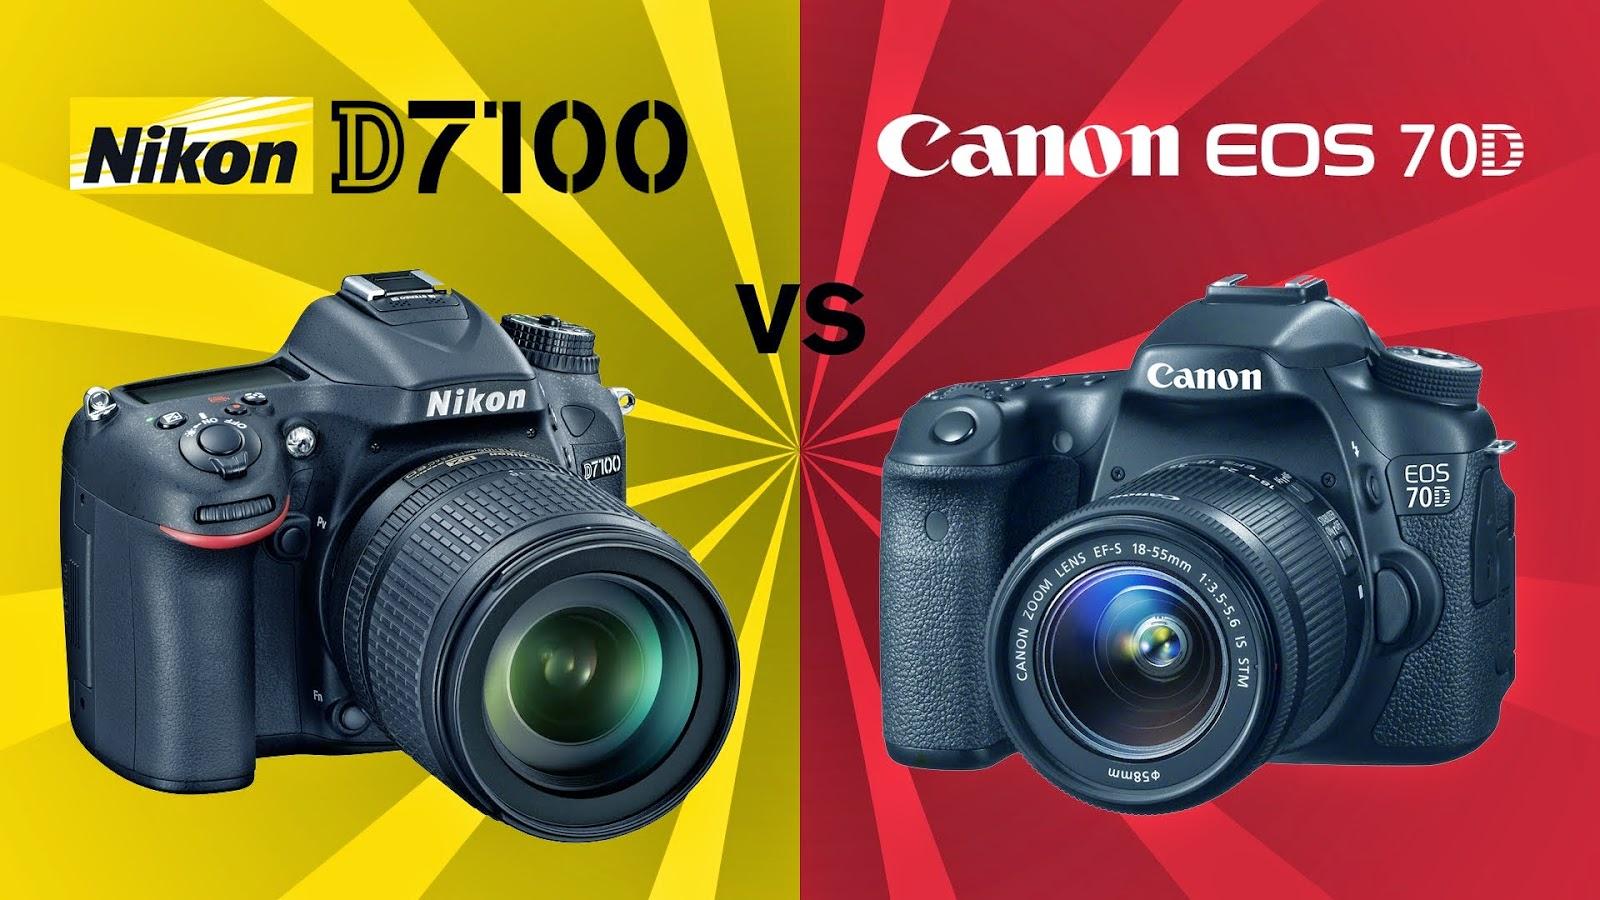 Camera Best Dslr Camera Canon Or Nikon canon vs nikon between myth and reality gadgets digital review dslr